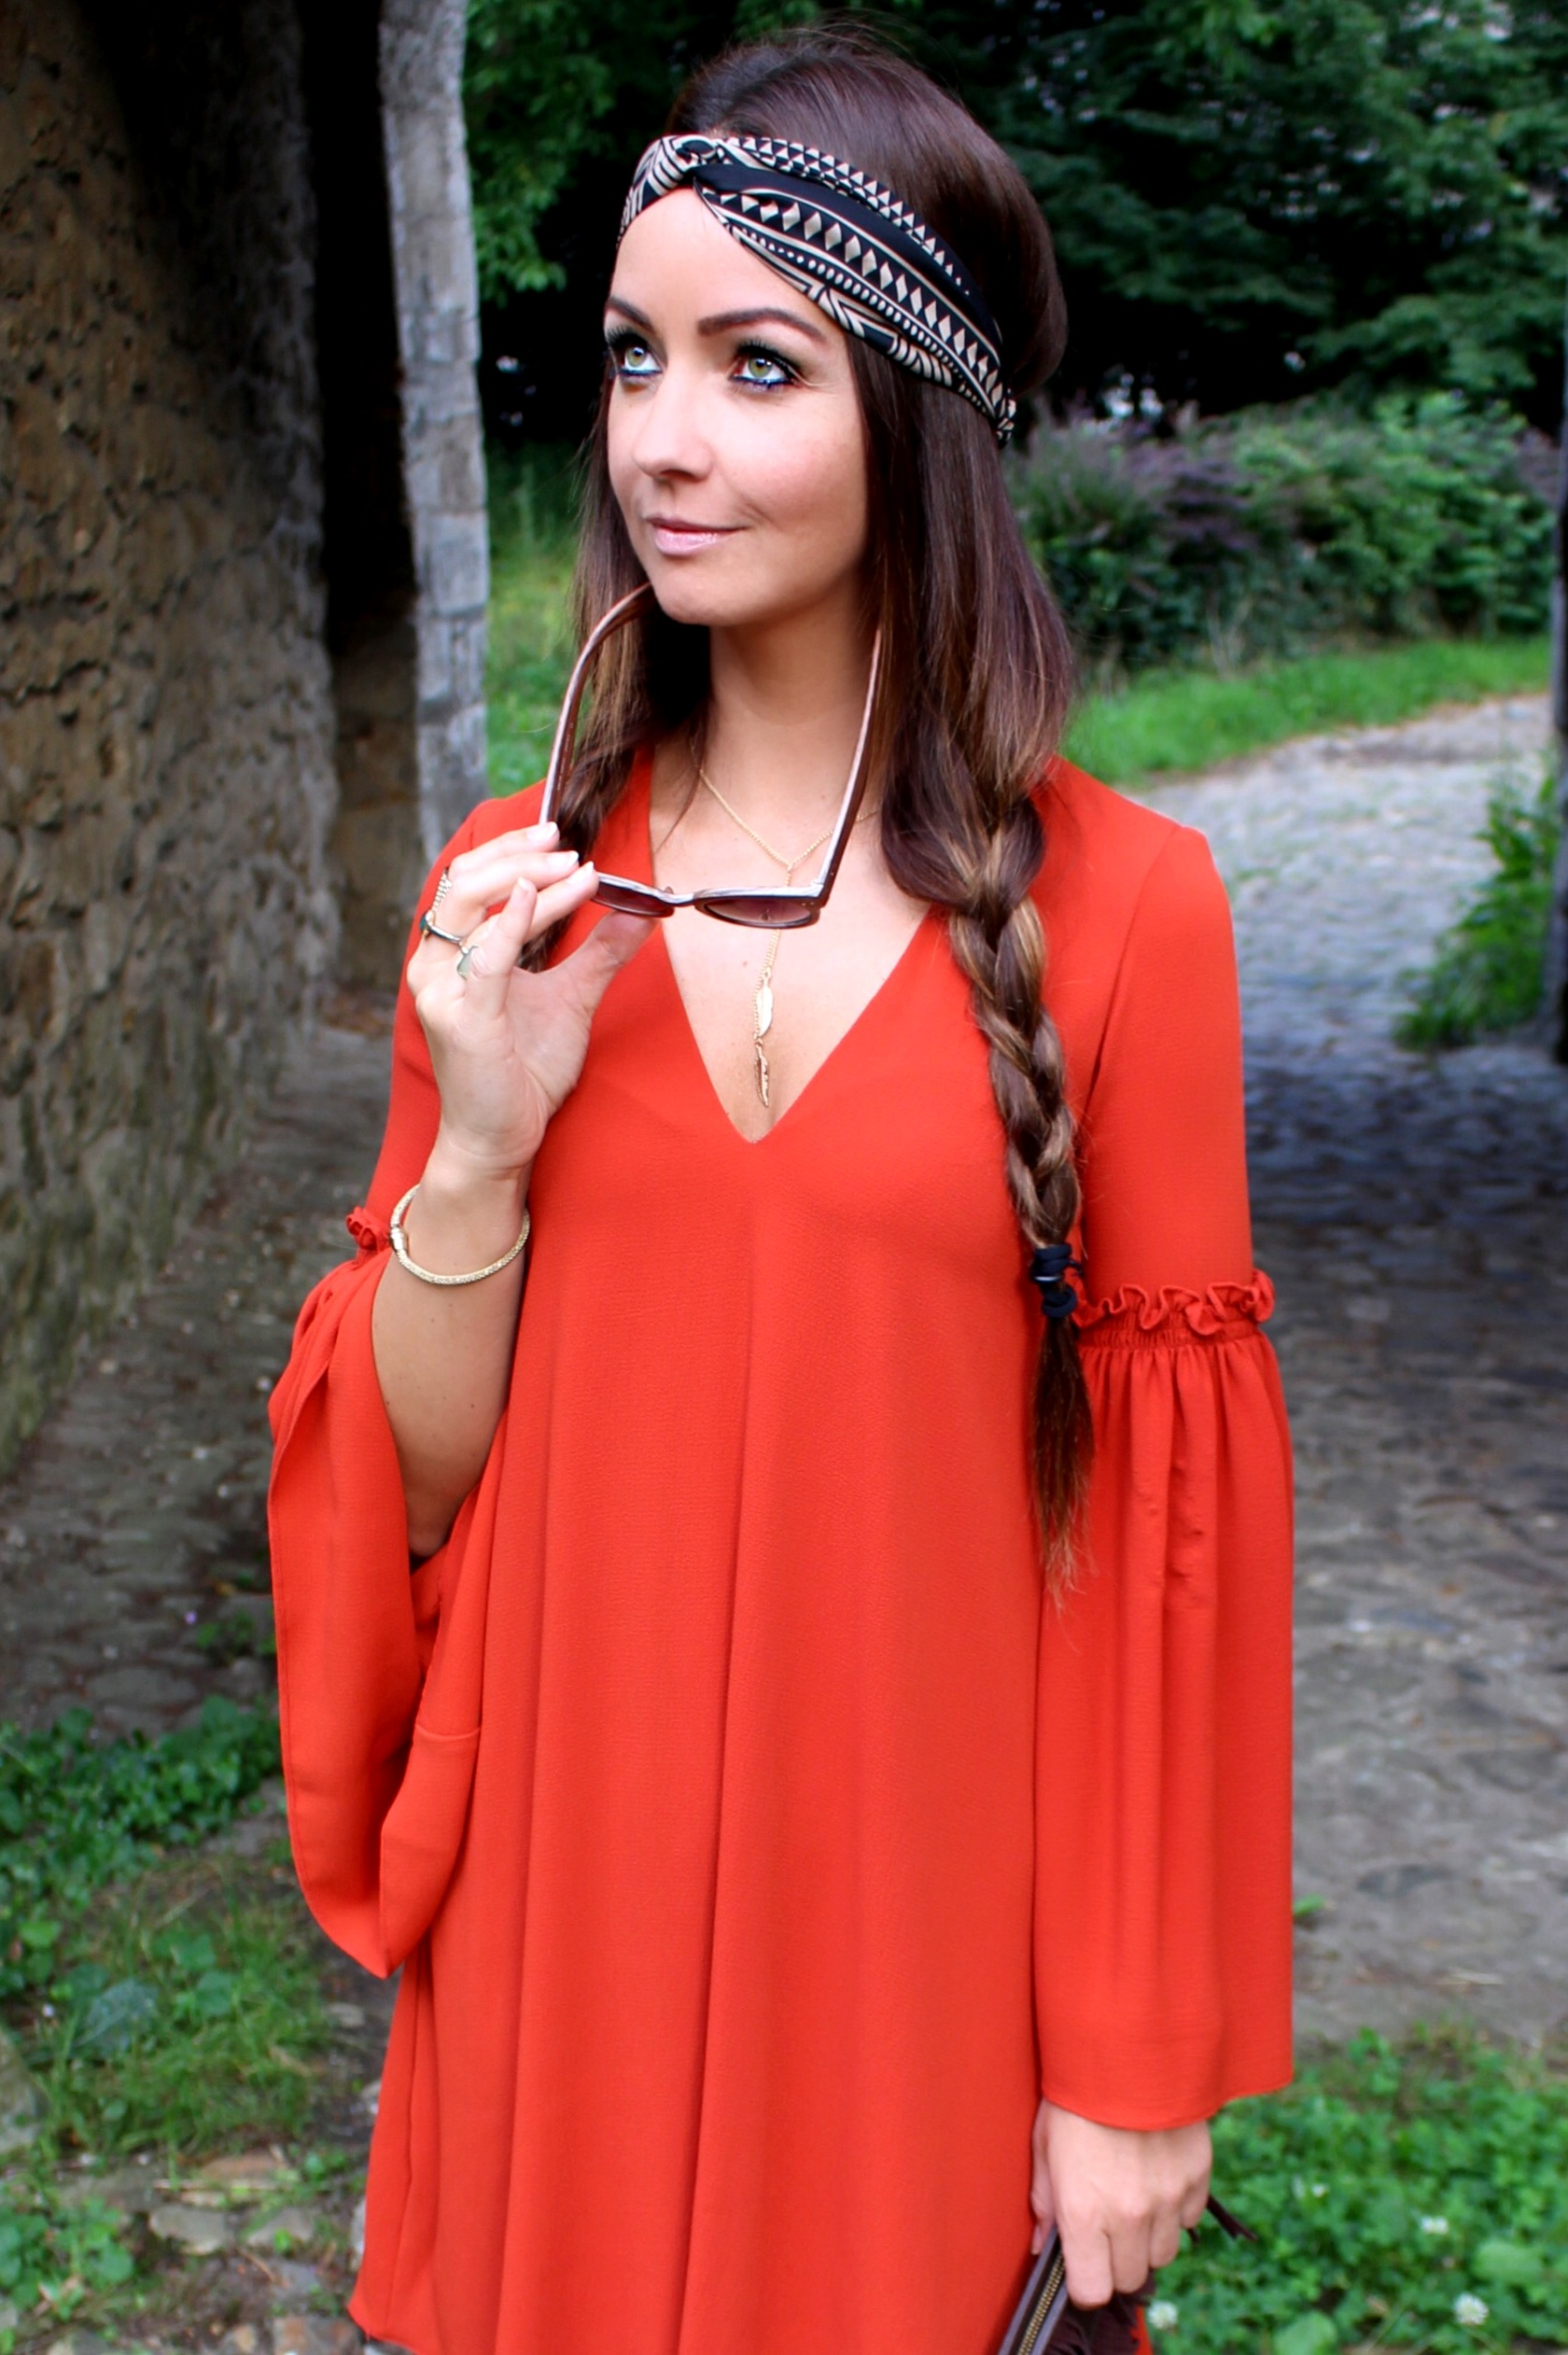 Fashioncircuz by Jenny img_0413a HIPPIEGIRL IN RED